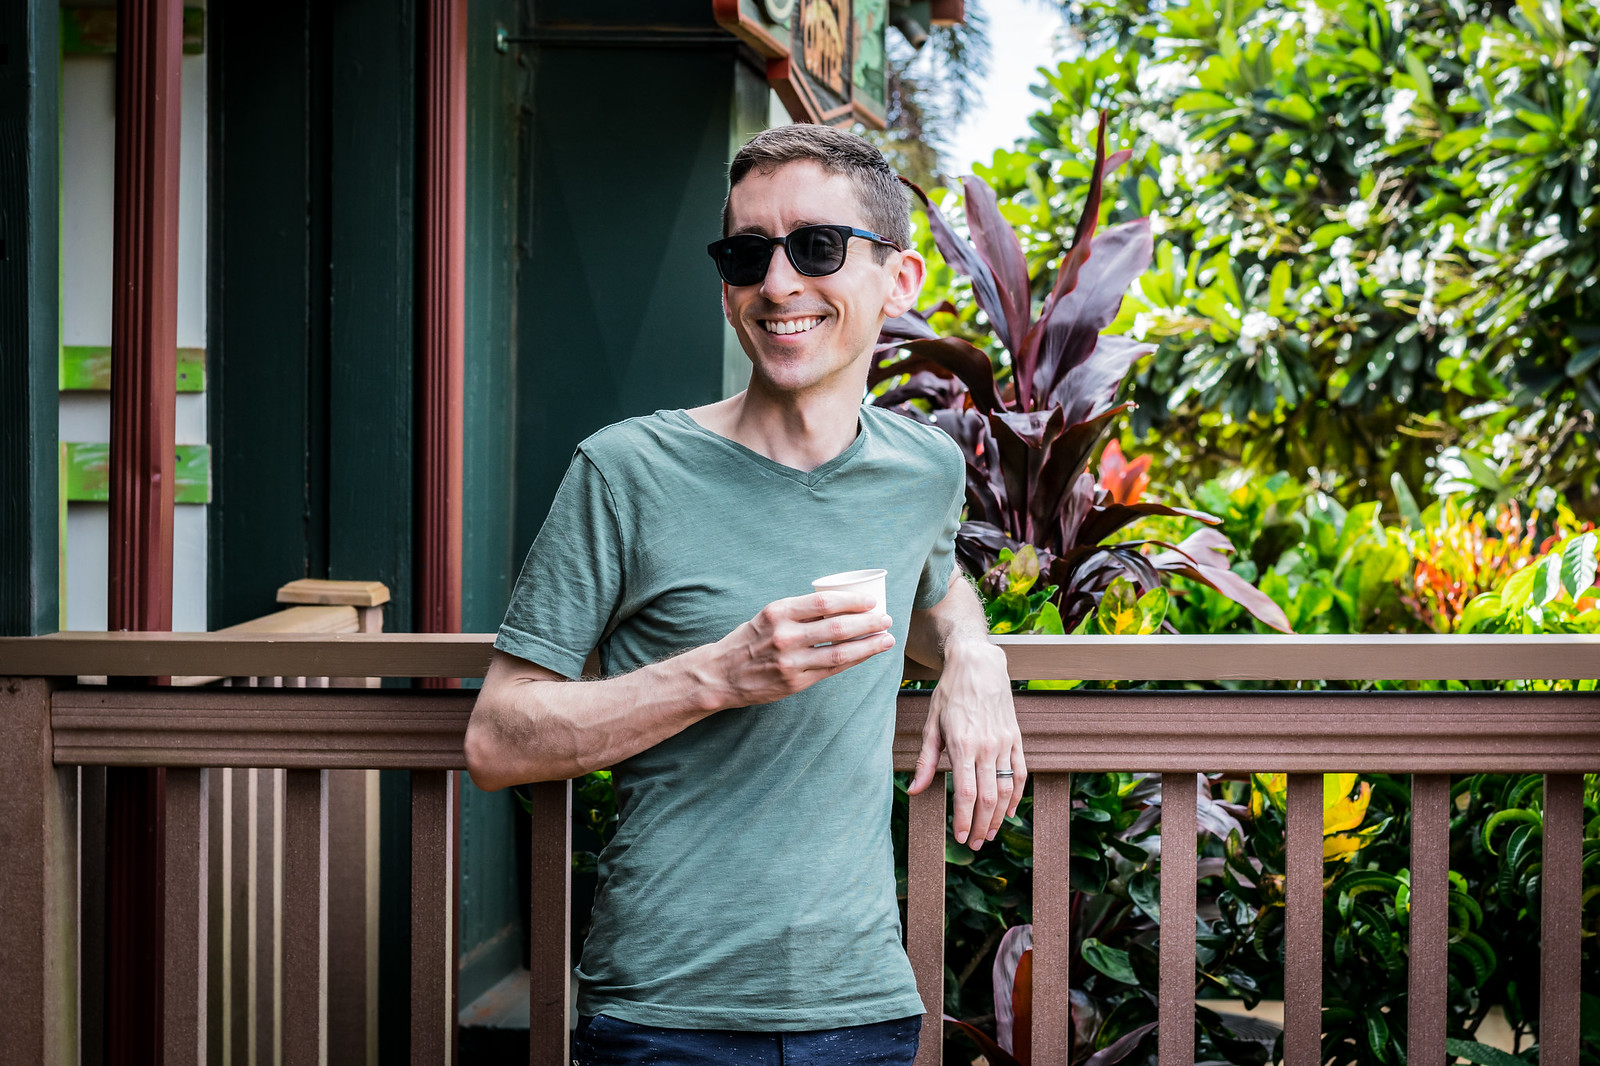 sampling the local specialty at Kauai Coffee